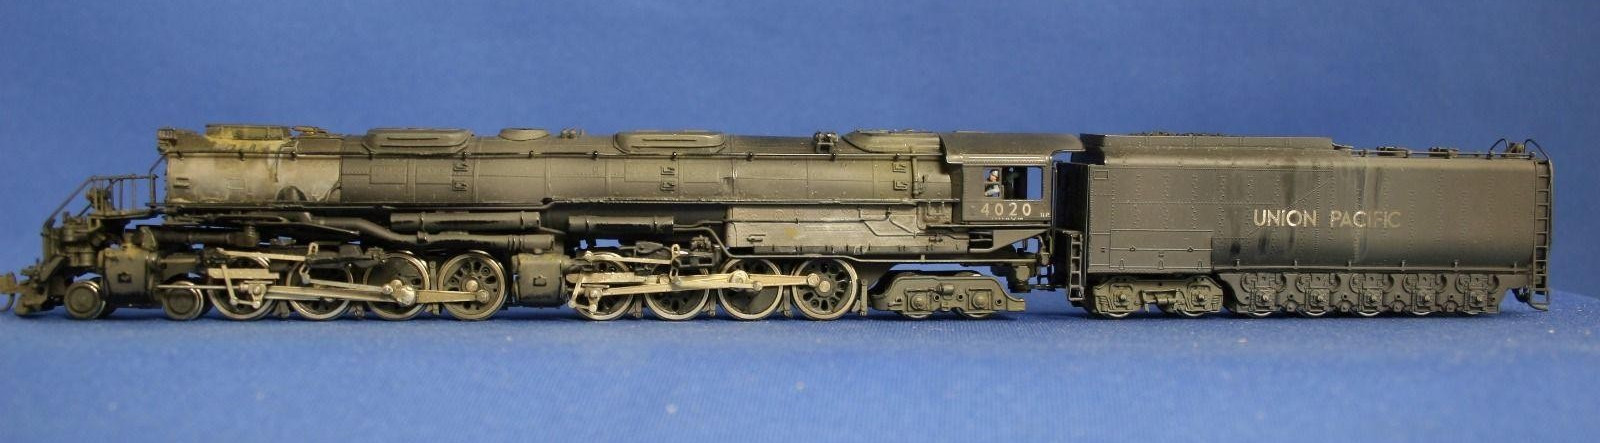 N Scale - Key - UP #4020 - Locomotive, Steam, 4-8-8-4 Big Boy - Union Pacific - 4020